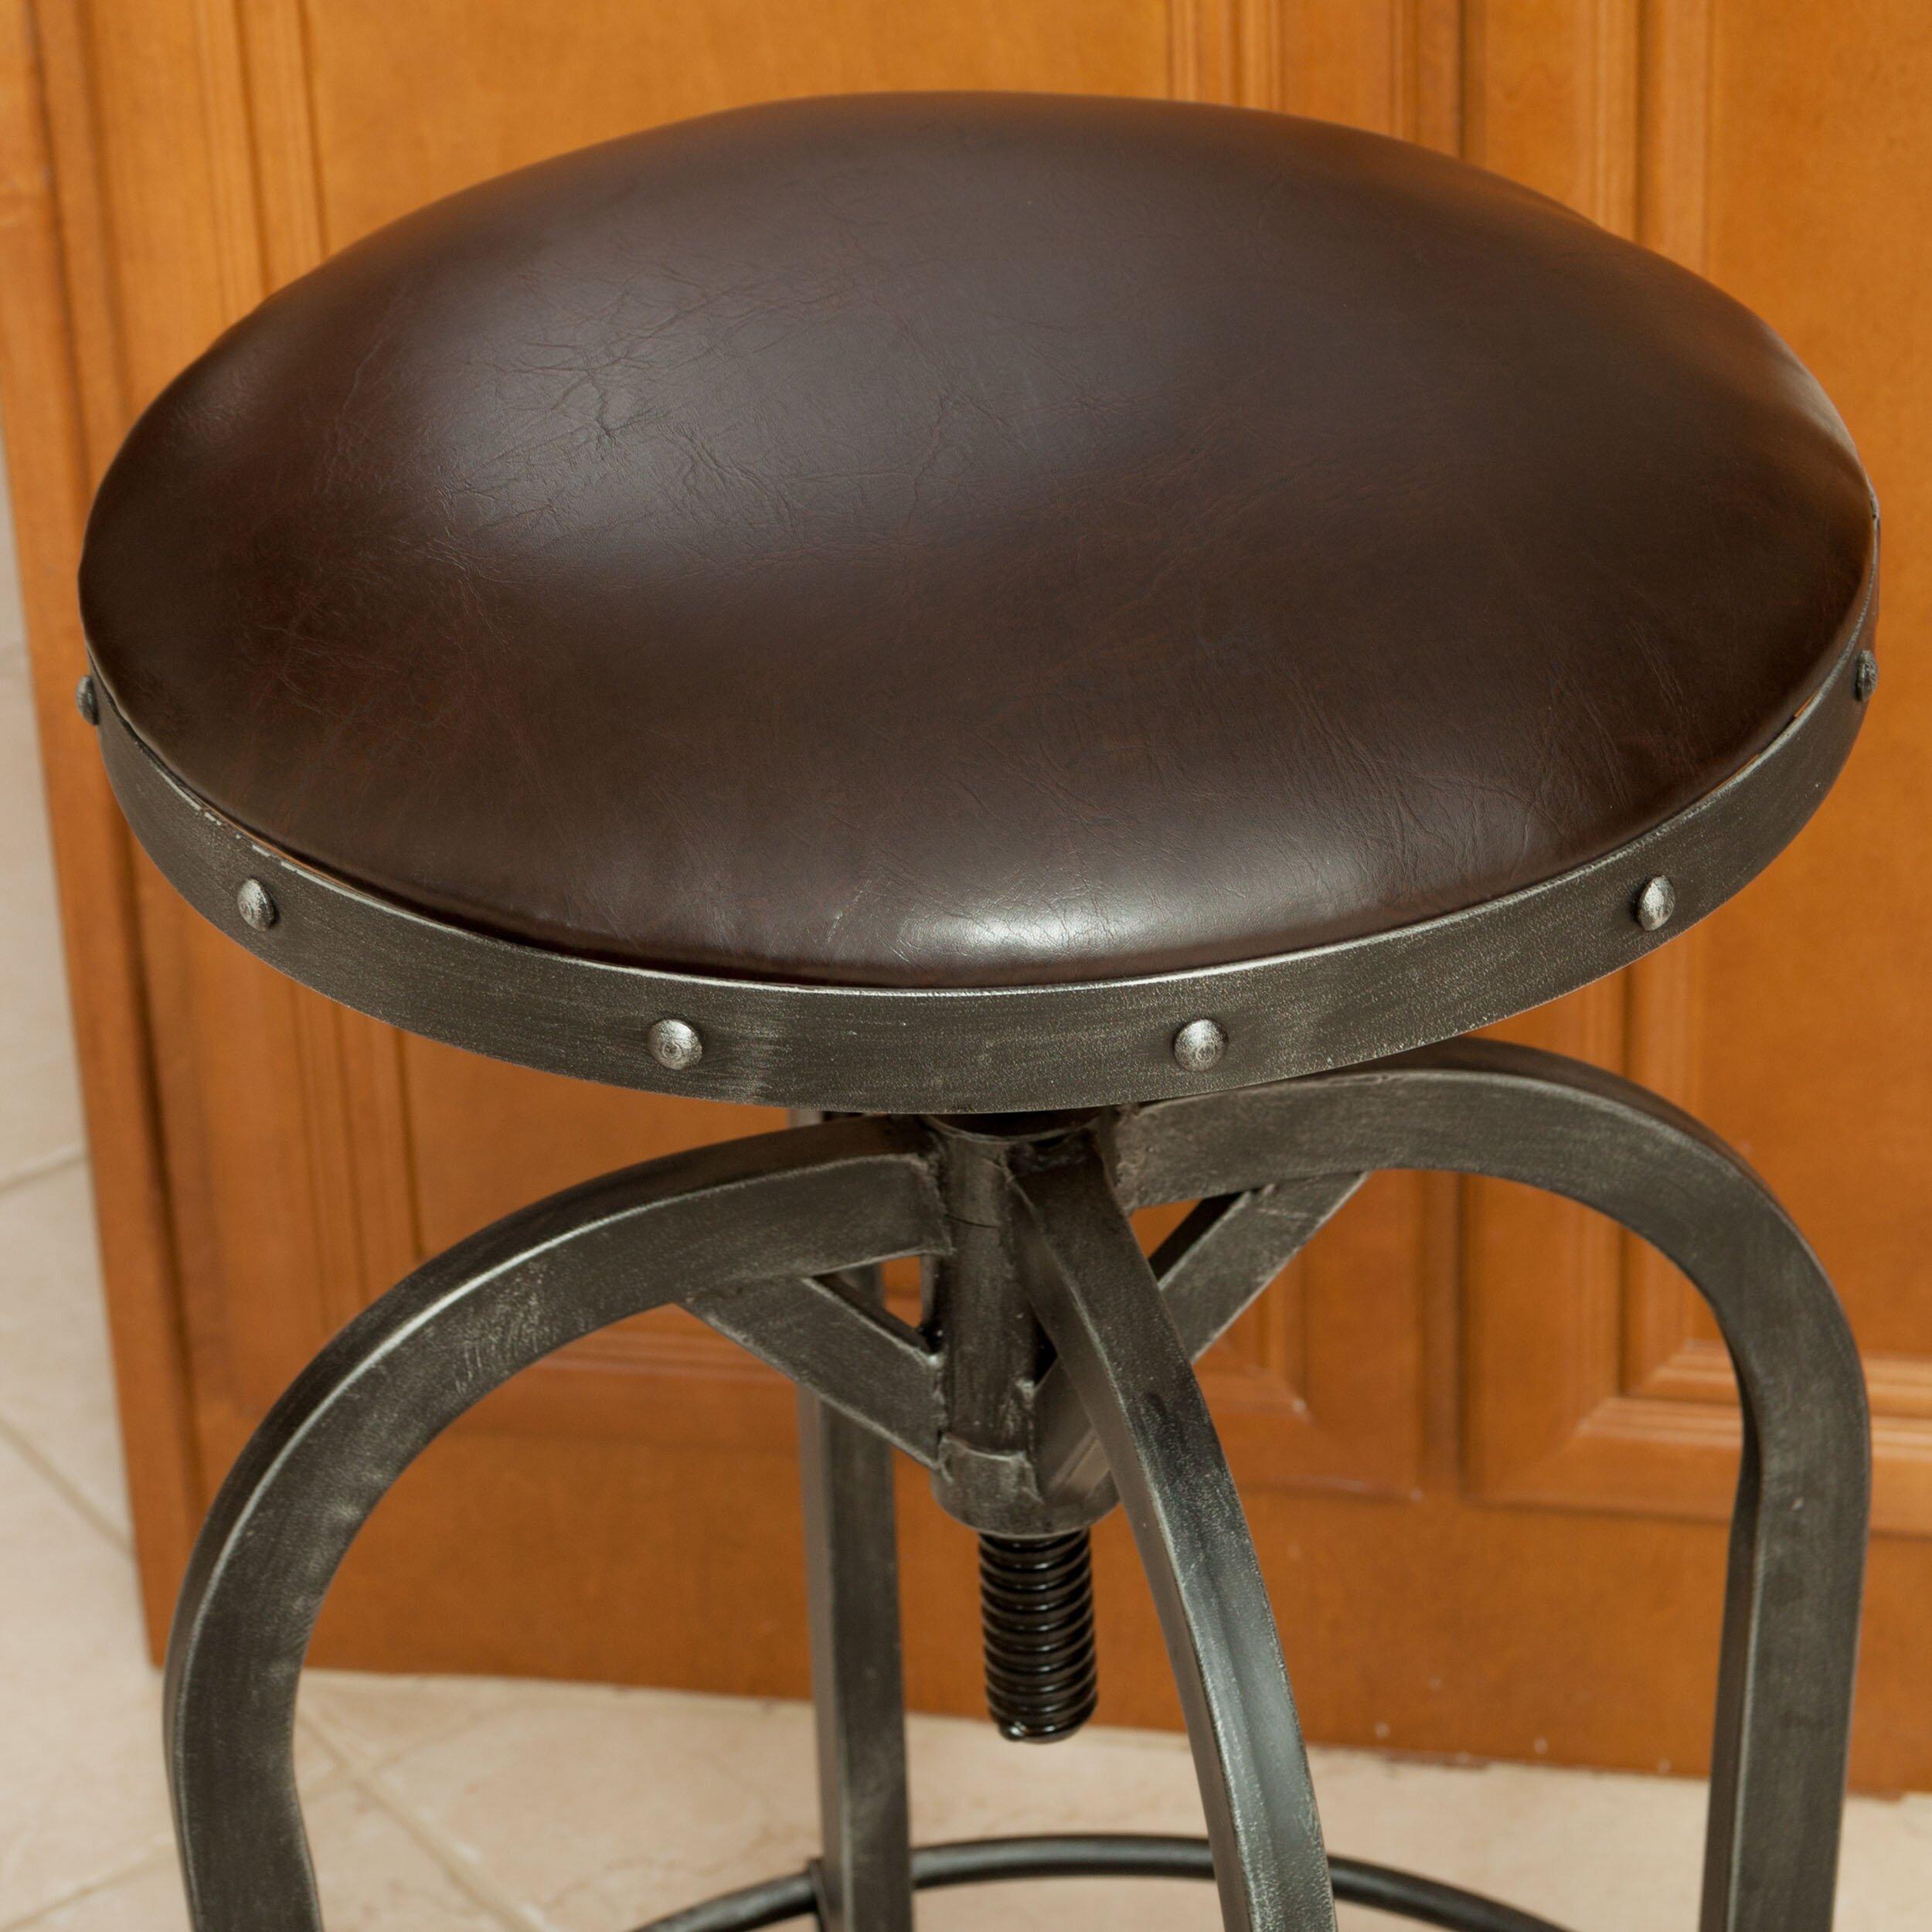 stress colored stool : Trent Austin Design Reg Mira Adjustable Height Swivel Bar Stool